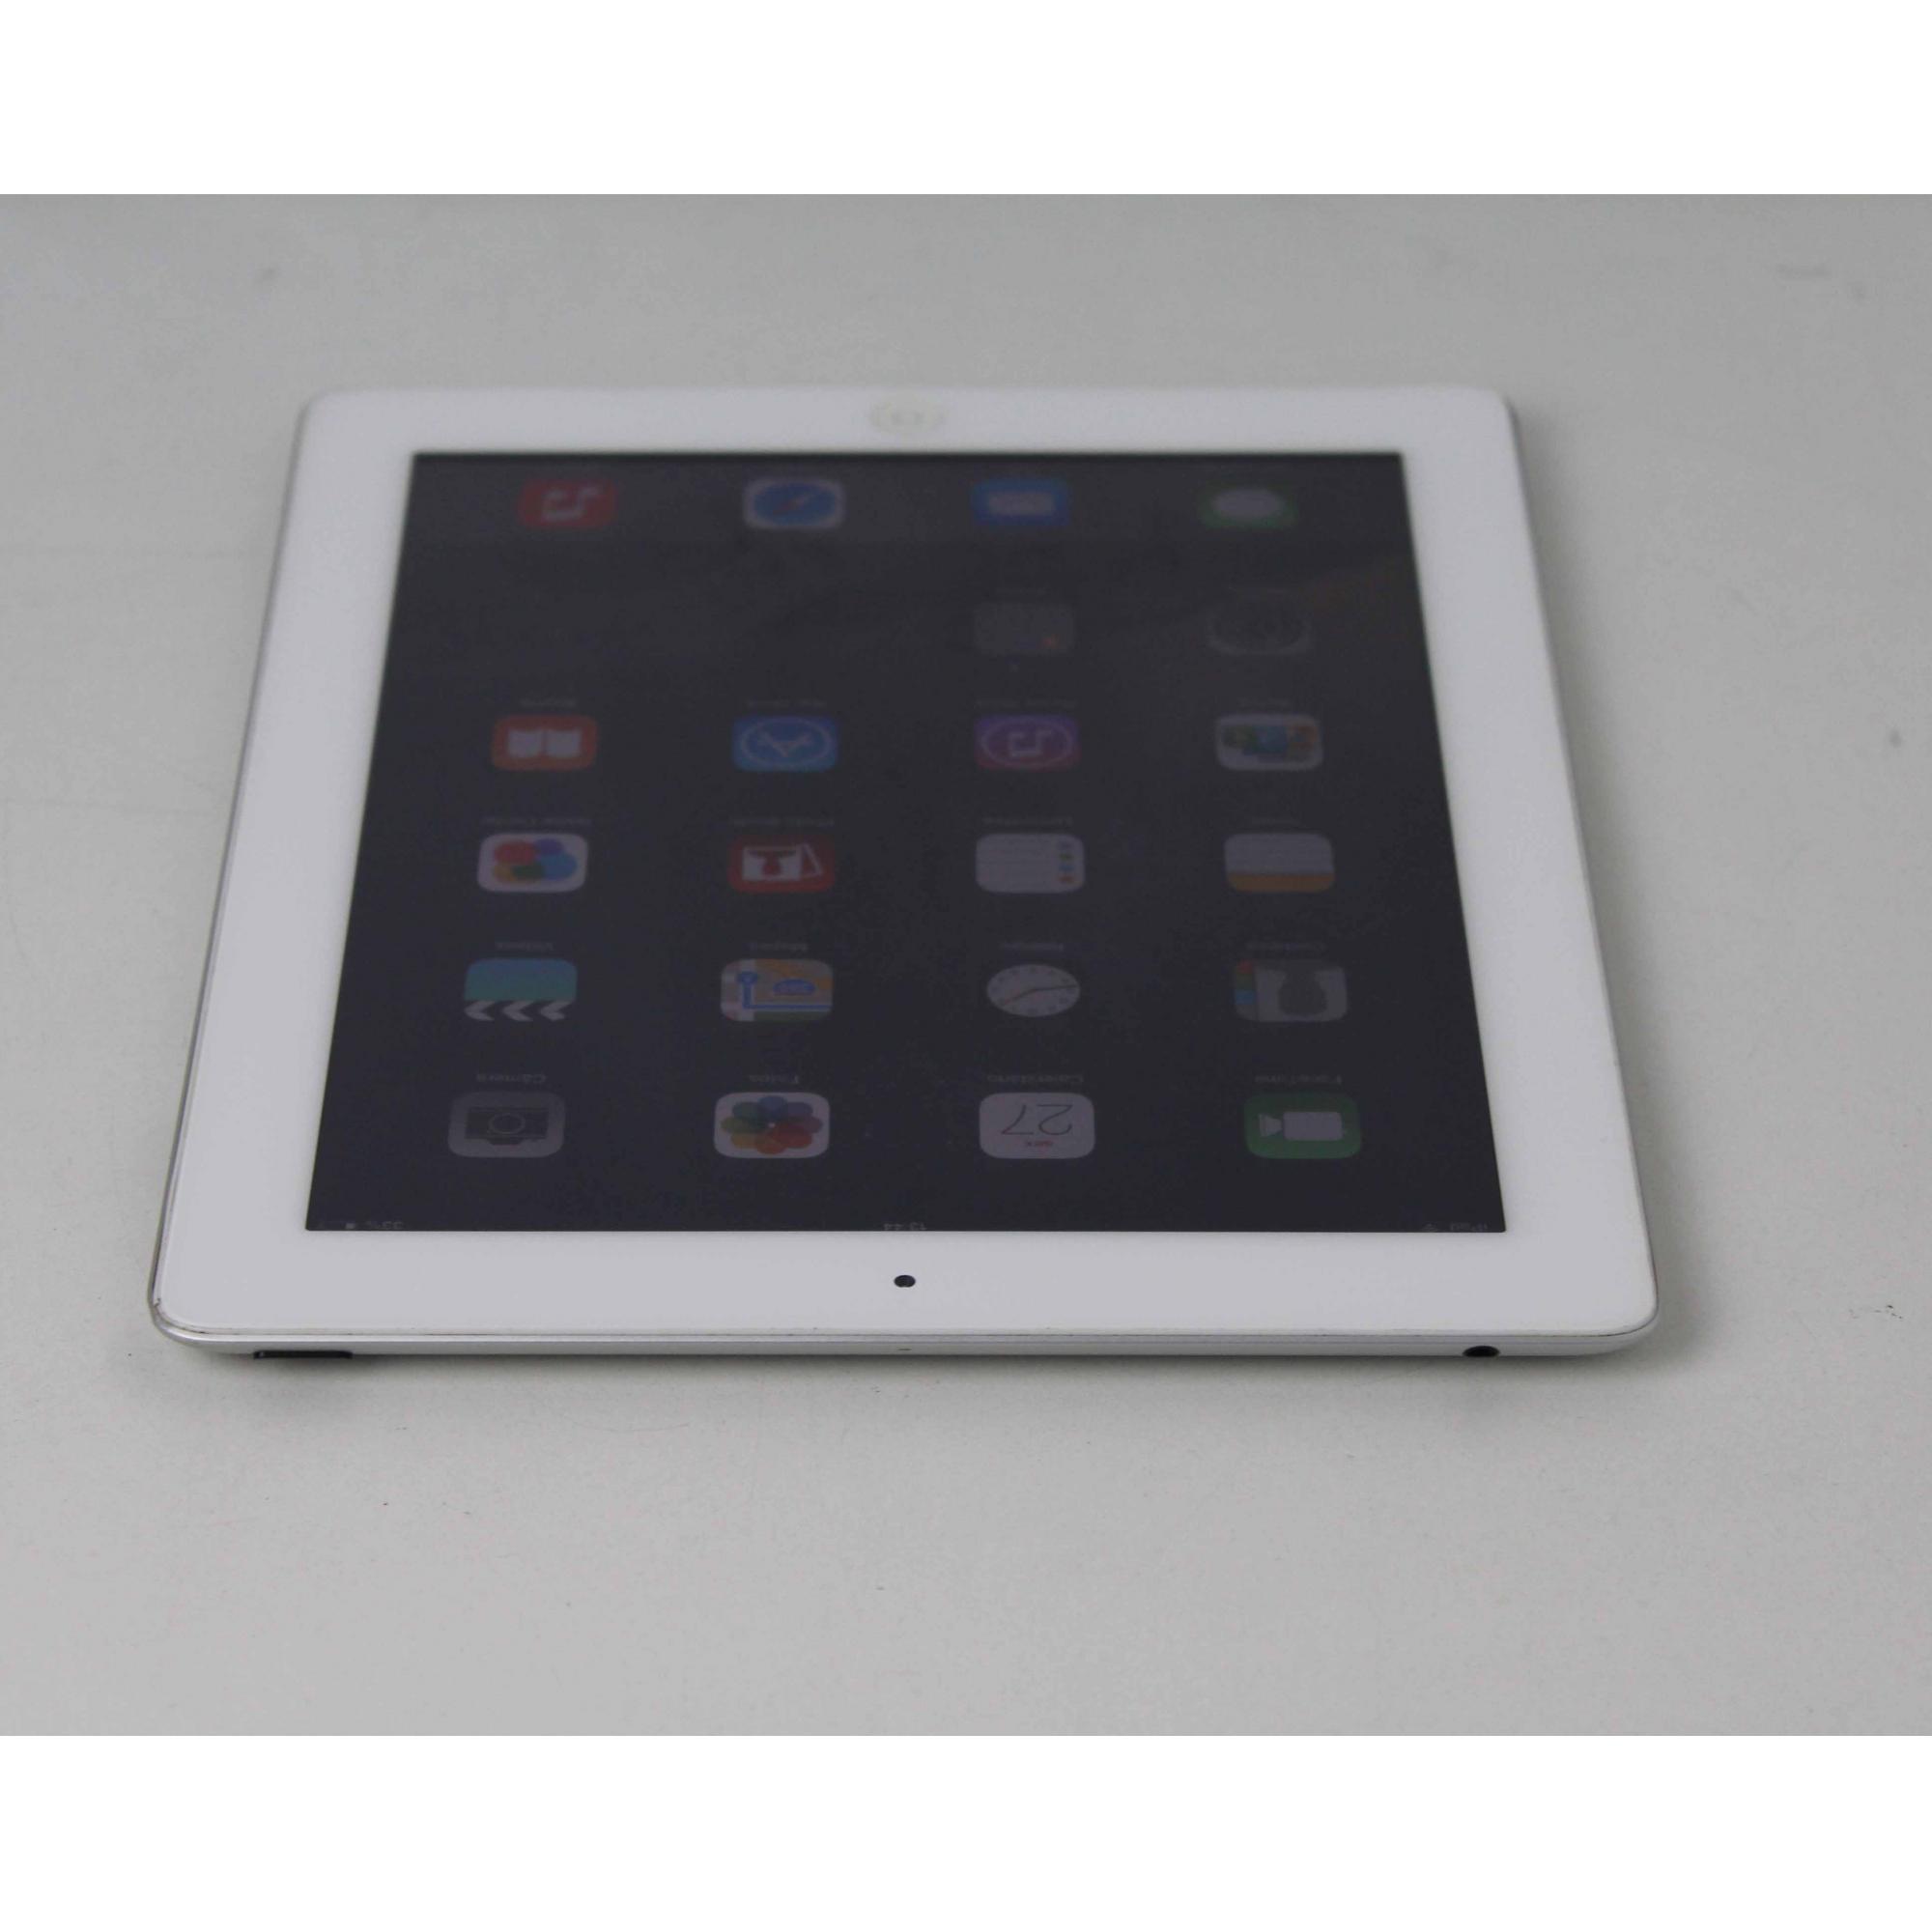 "iPad 2 MC979BR/A 9.7"" 16GB Wifi - Silver"